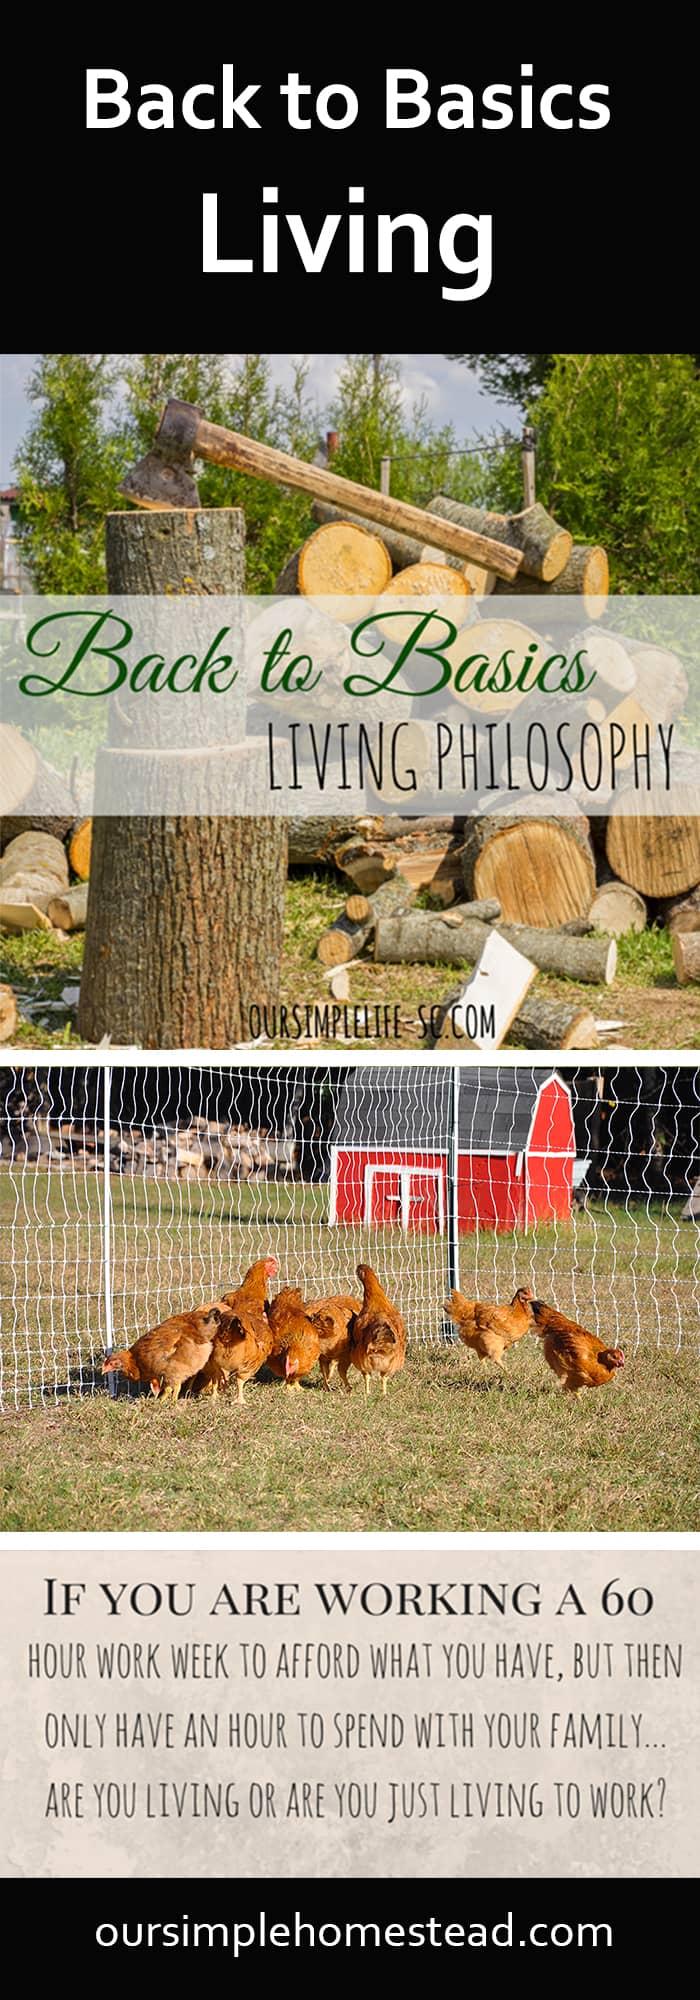 Back to Basics Living